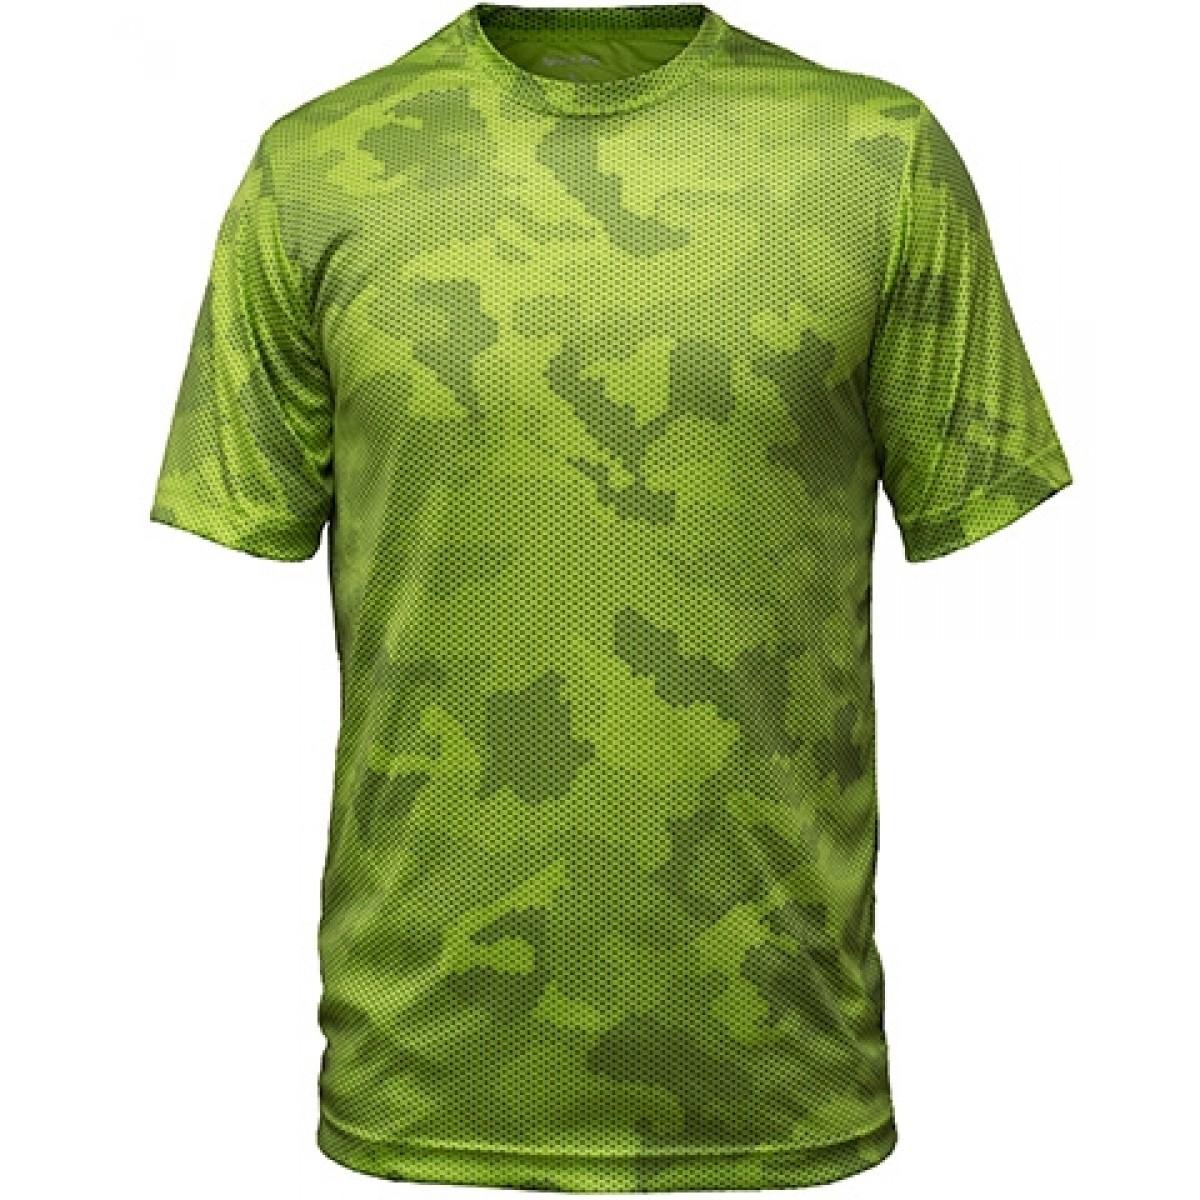 Camo Short Sleeve-Green-YM